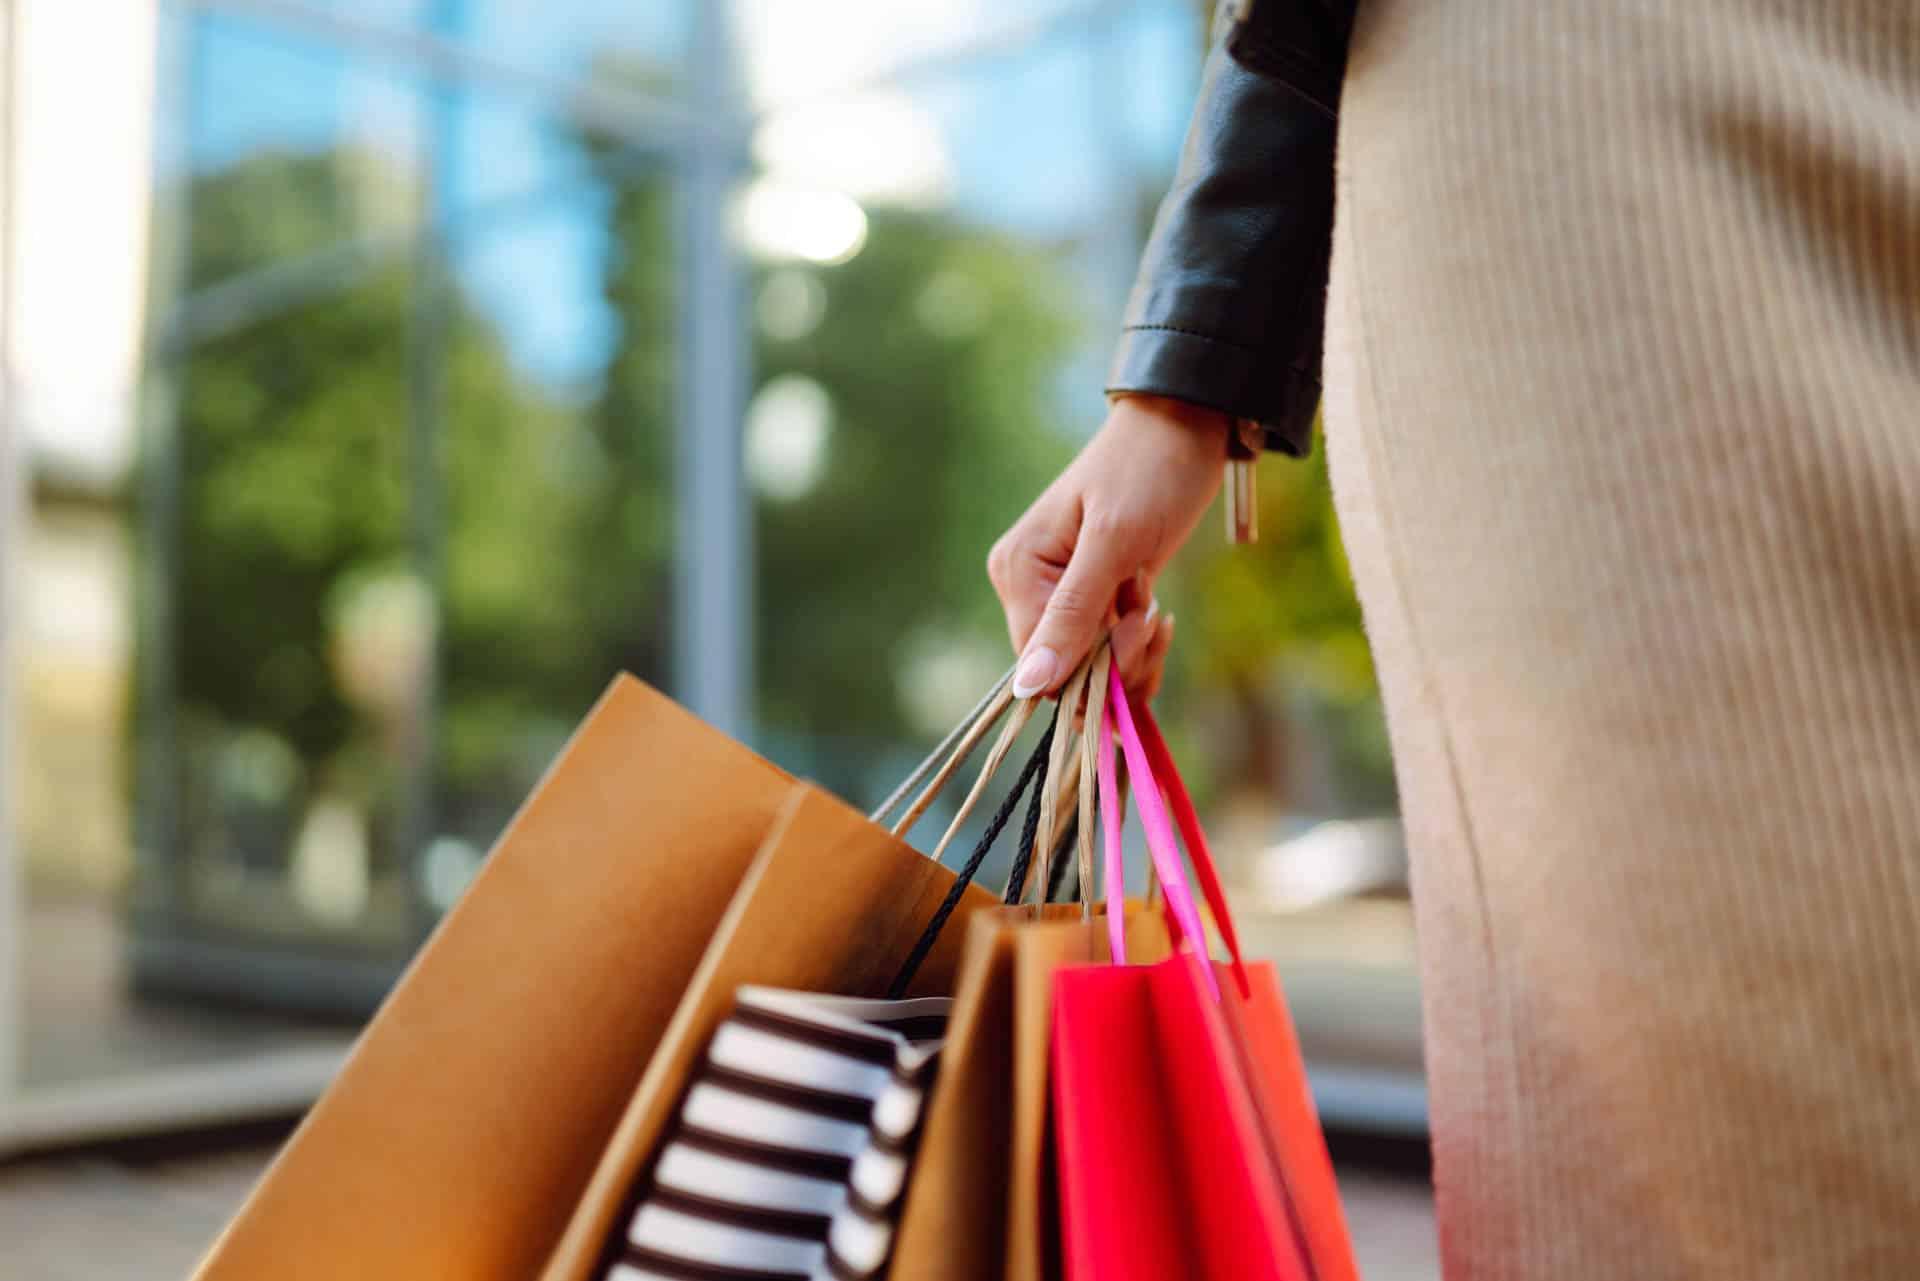 Woman shopping on Corporation Street in BIrmingham City Centre